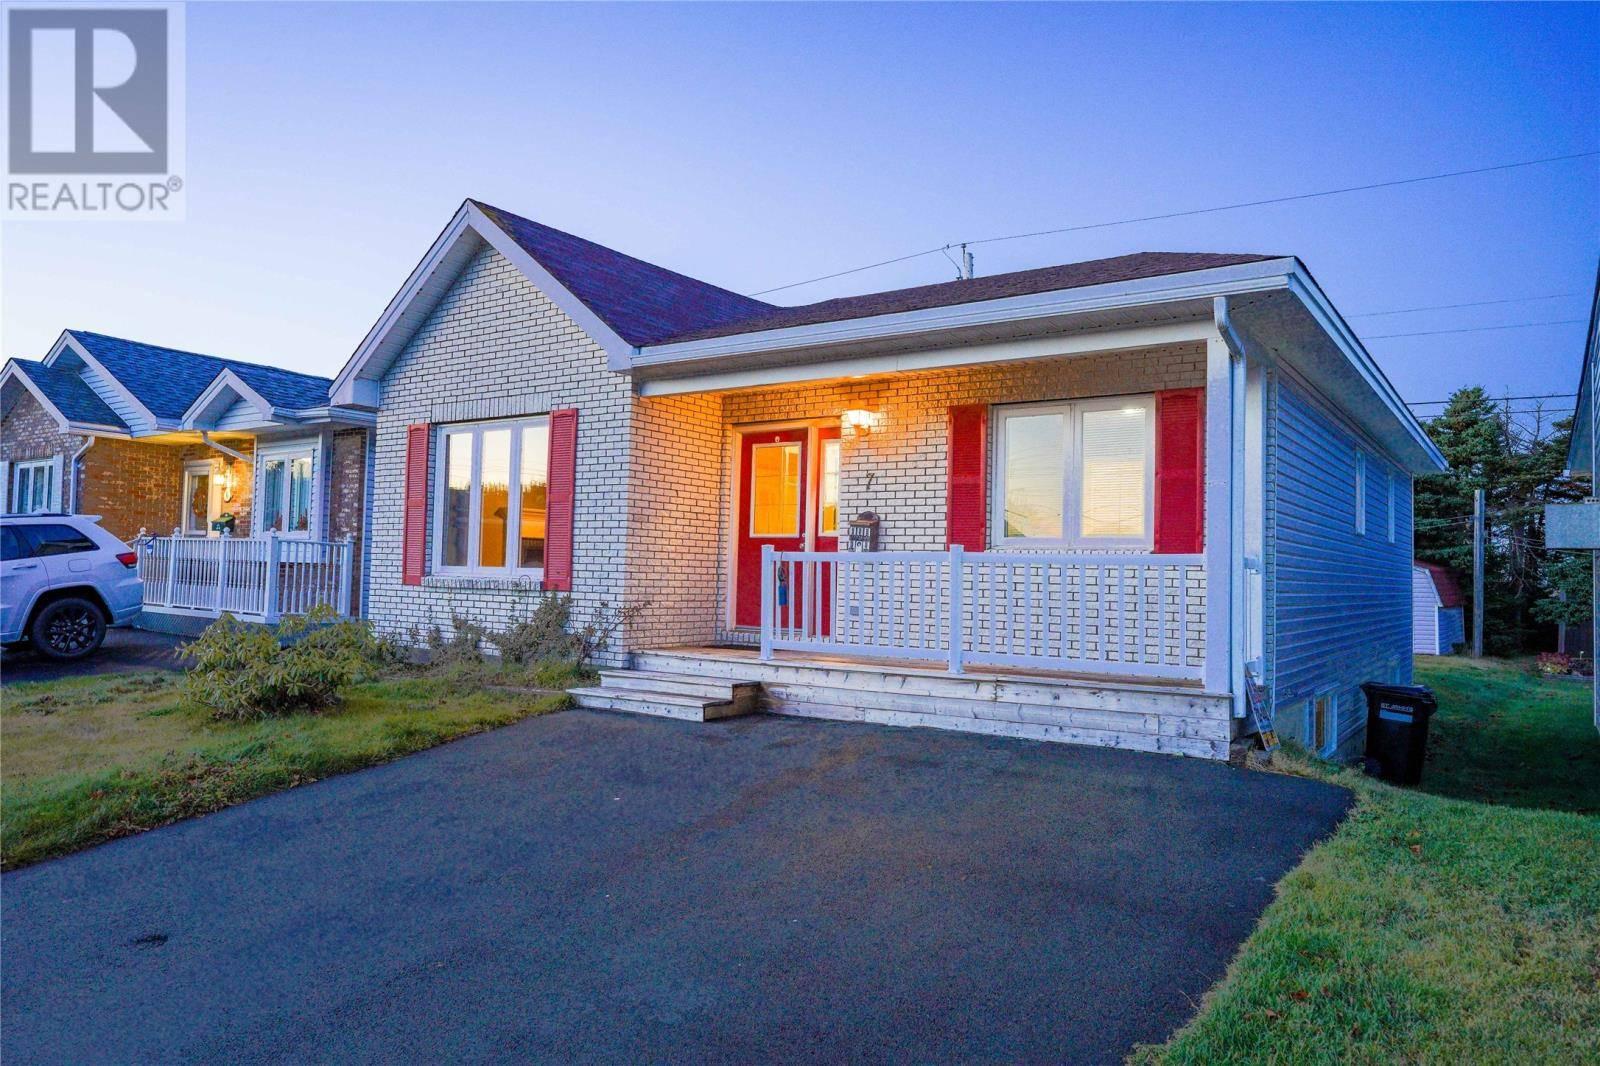 House for sale at 7 Errol Pl St. John's Newfoundland - MLS: 1207600